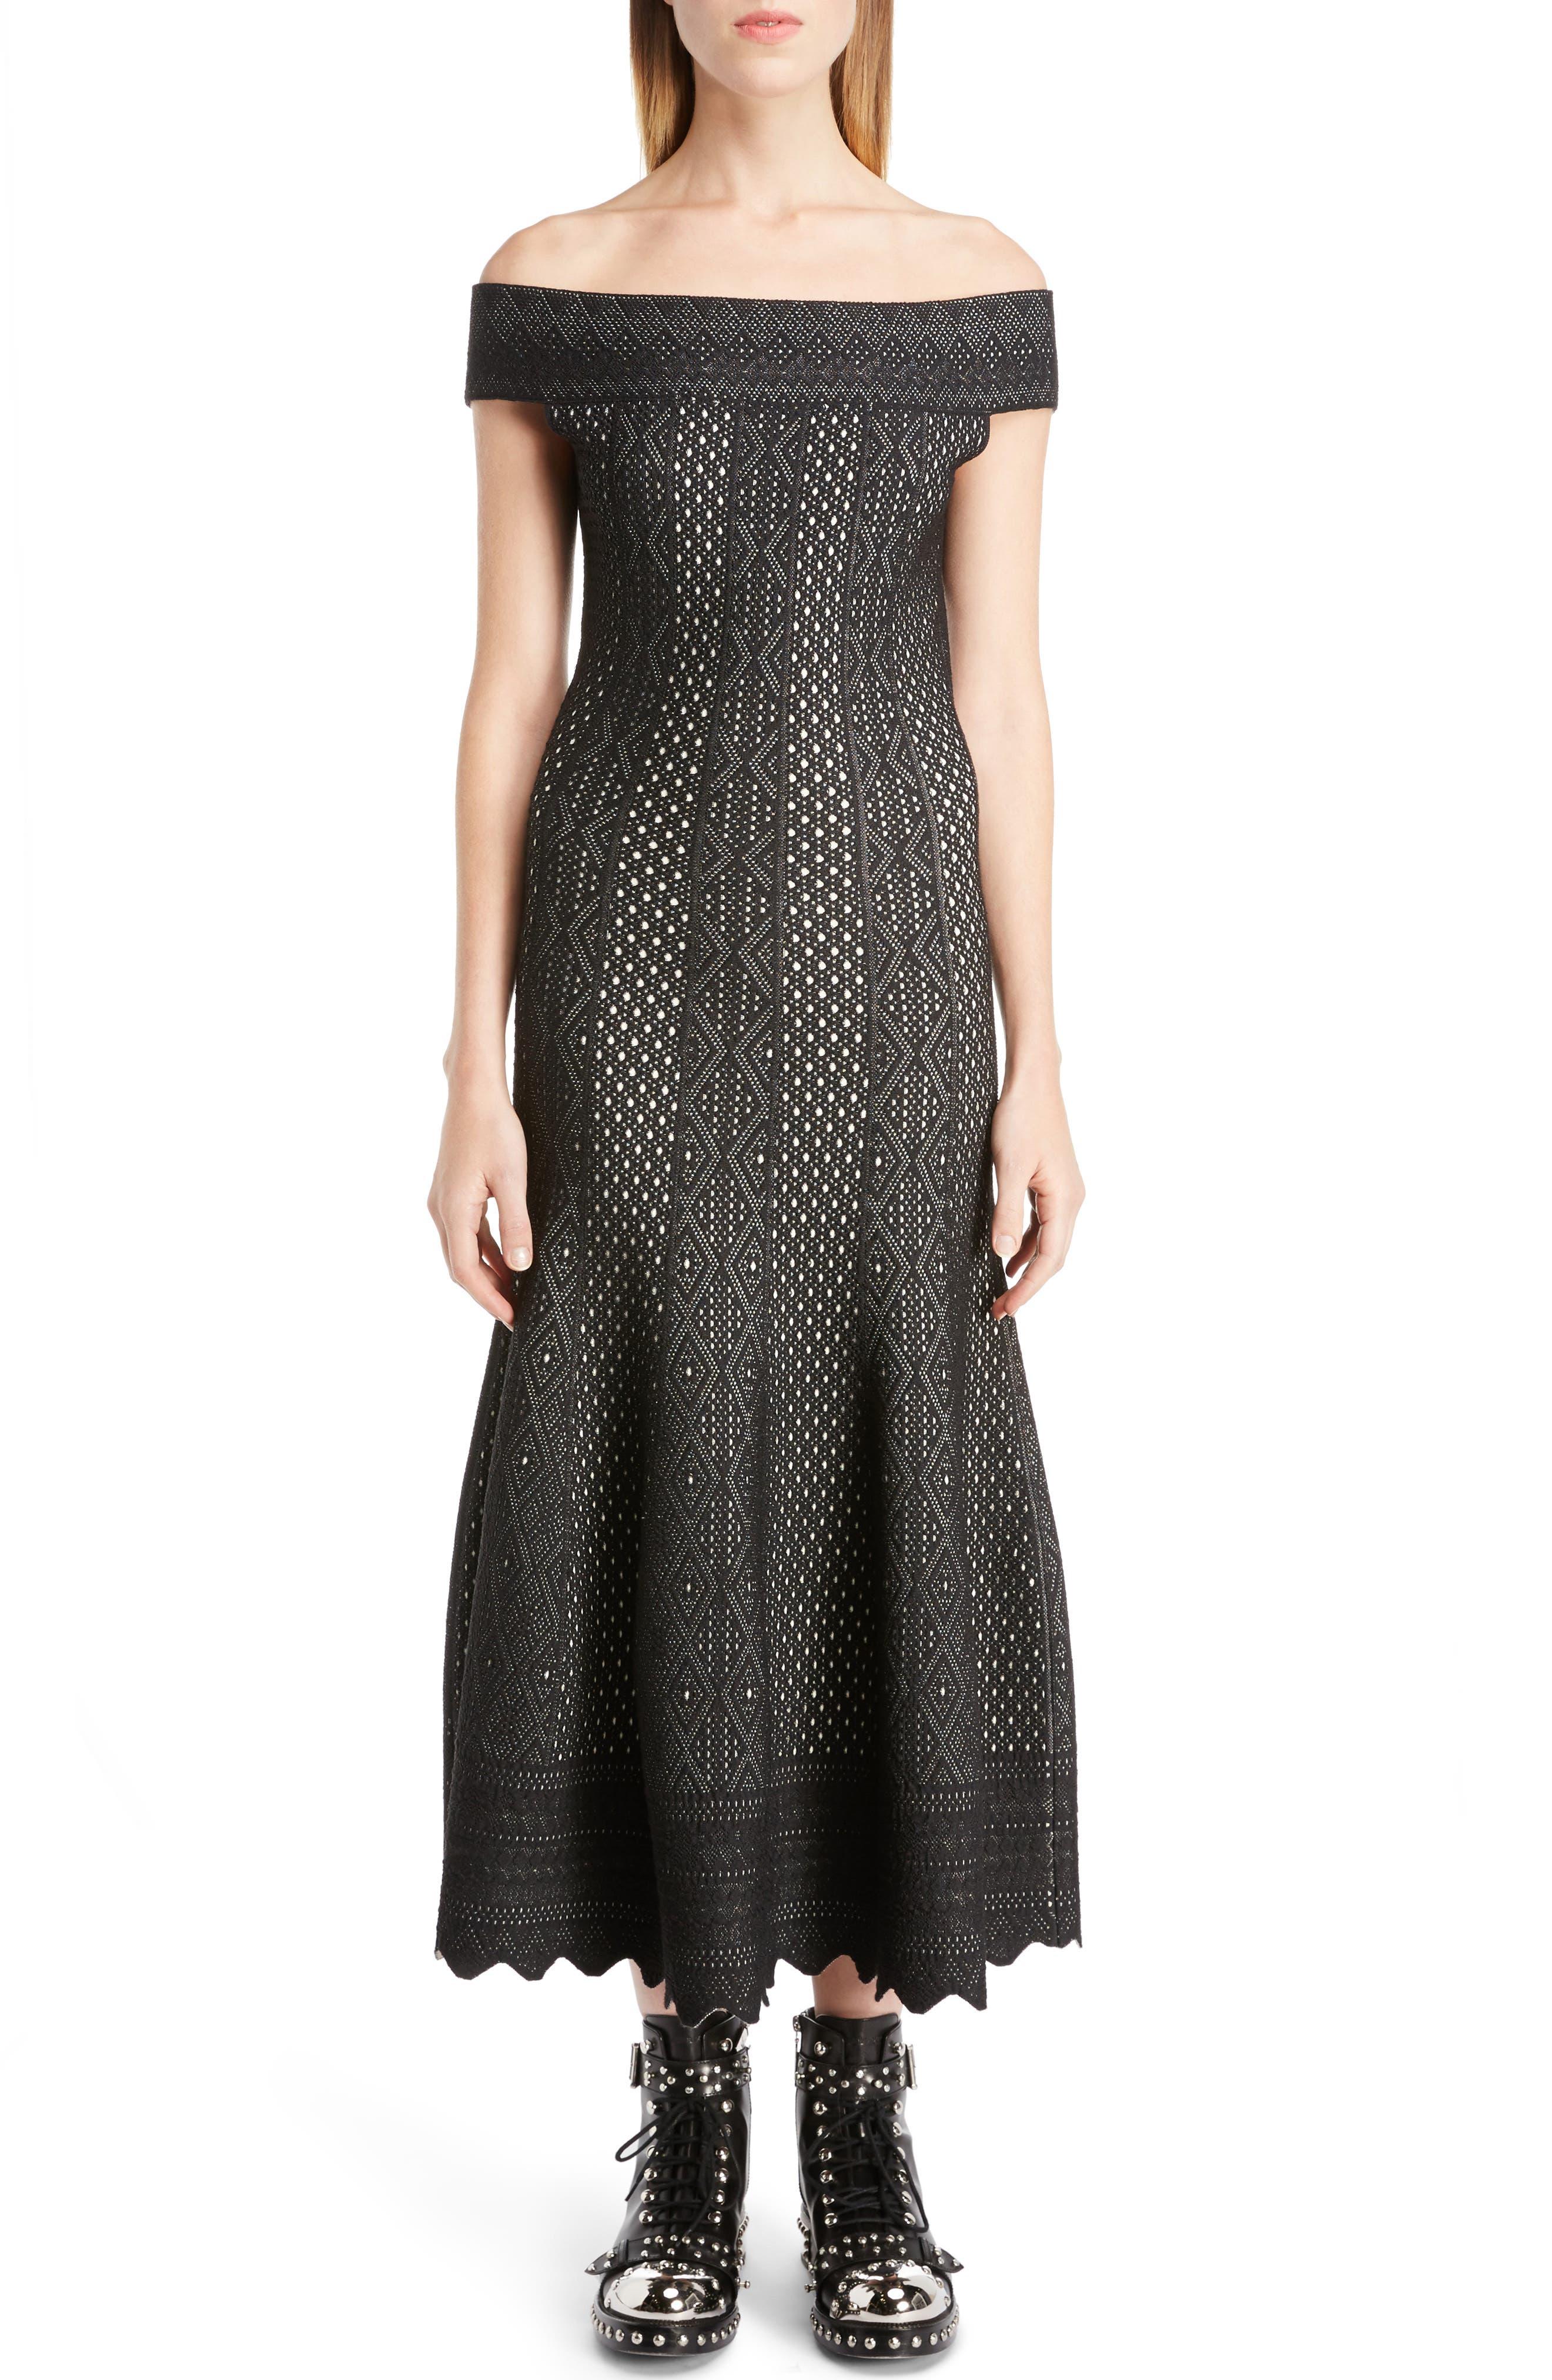 Alternate Image 1 Selected - Alexander McQueen Off the Shoulder Bicolor Jacquard Dress